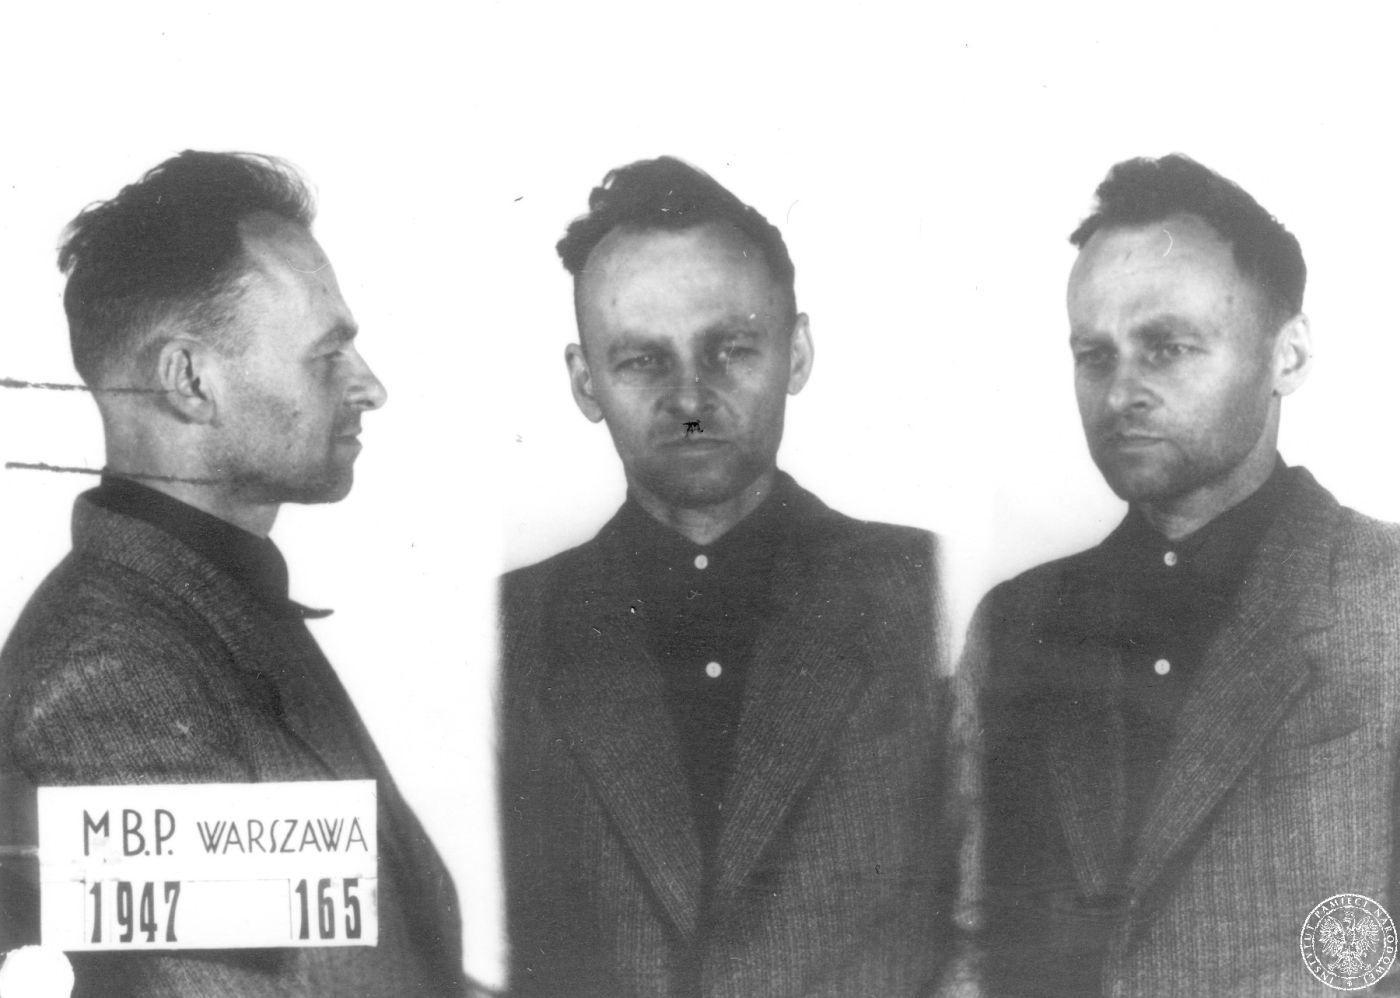 File:Pilecki photo 1947.jpg